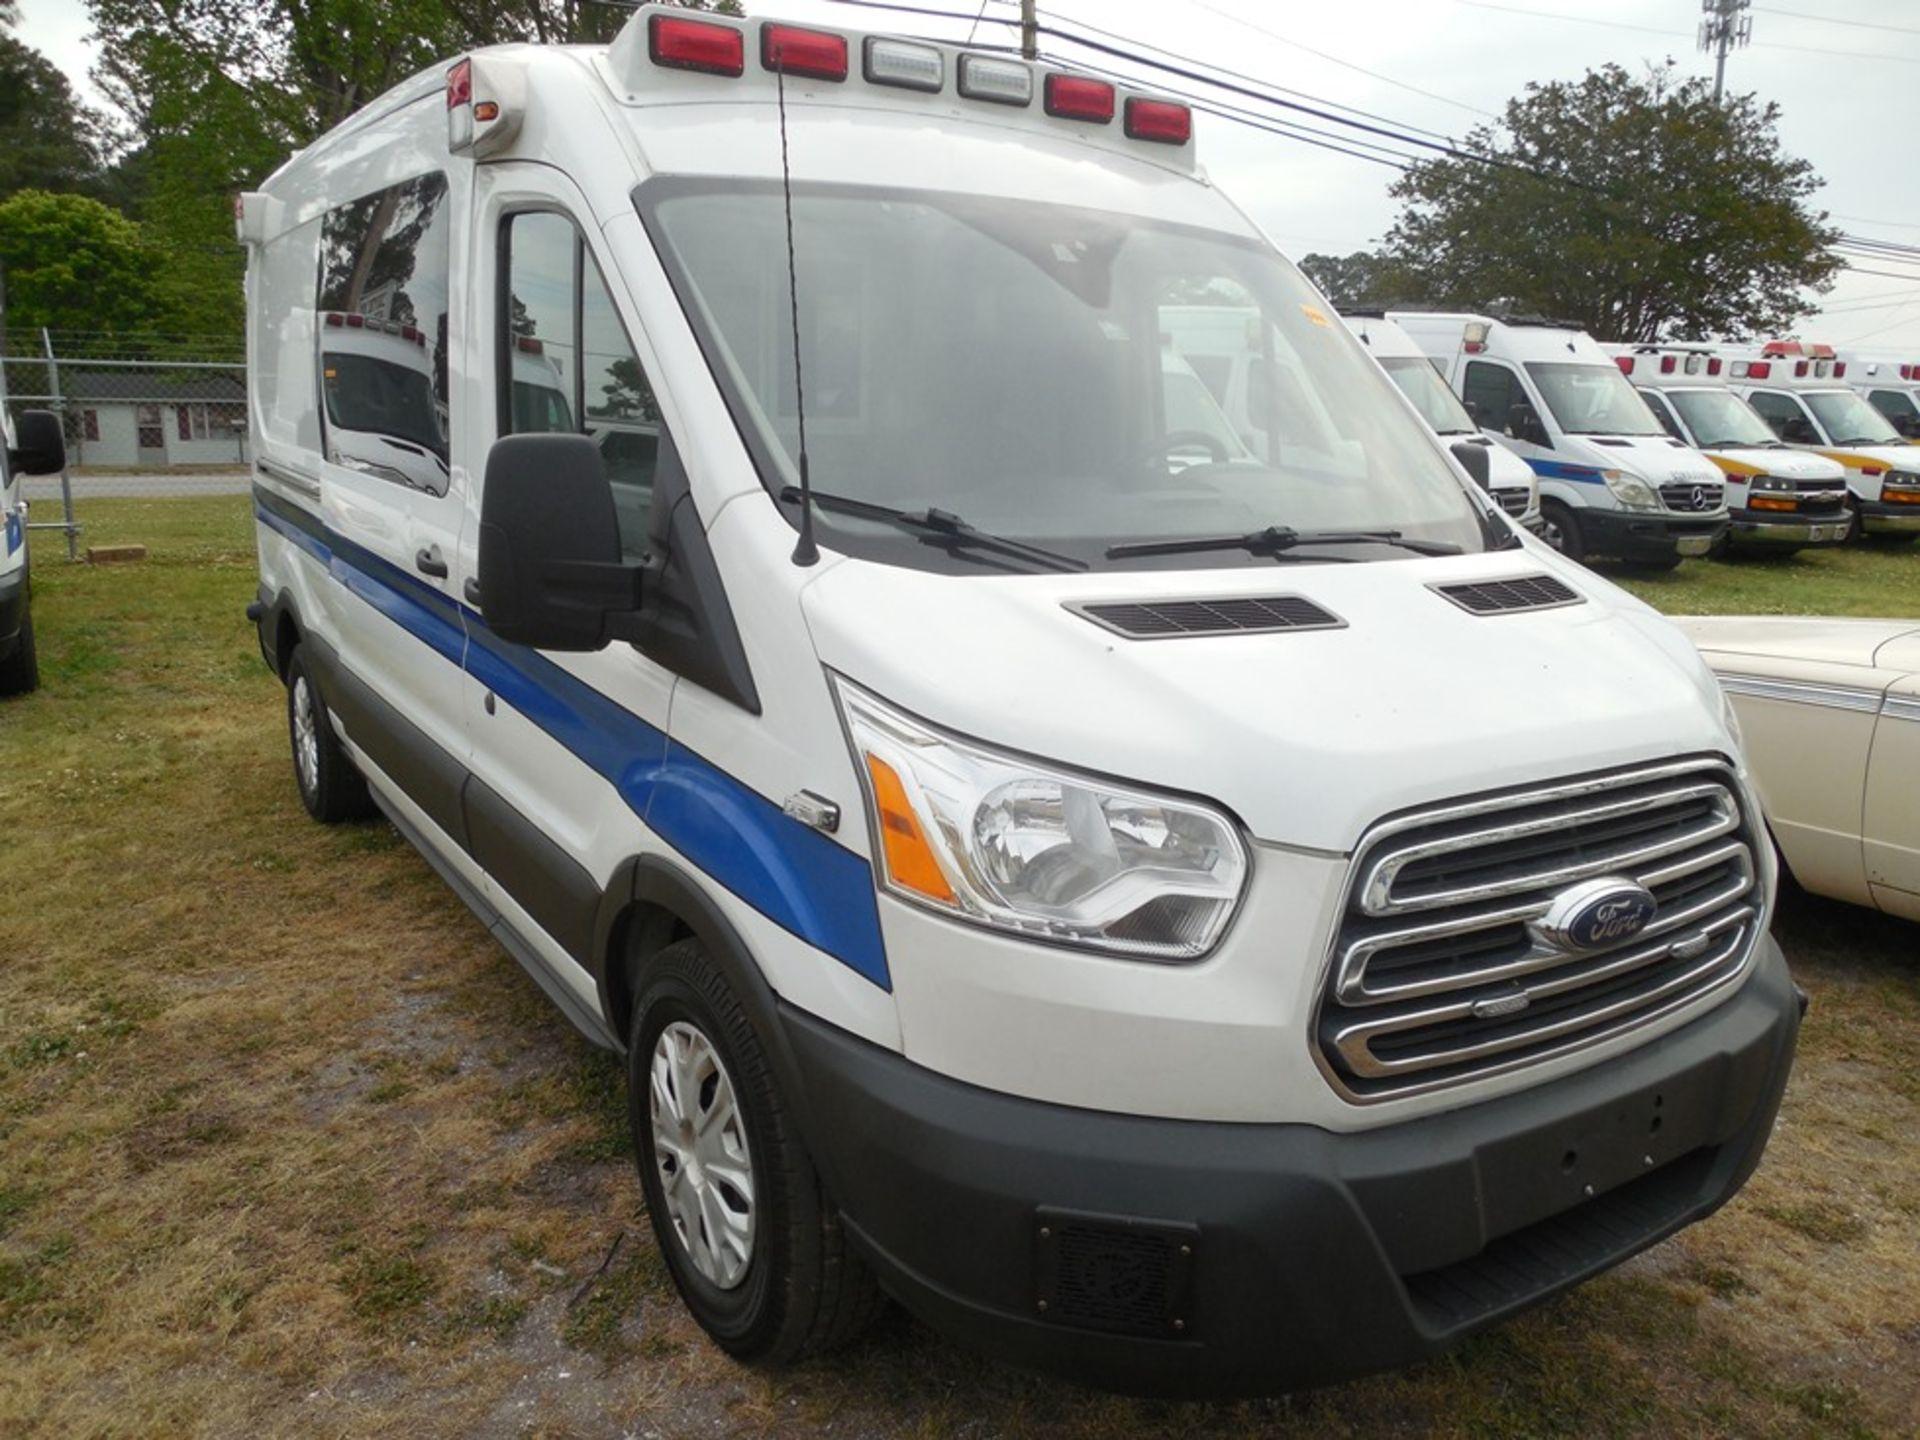 2017 Ford Tansit 250 dsl ambulance 178,503 miles vin# 1FDYR2CV2HKA57713 - Image 3 of 6